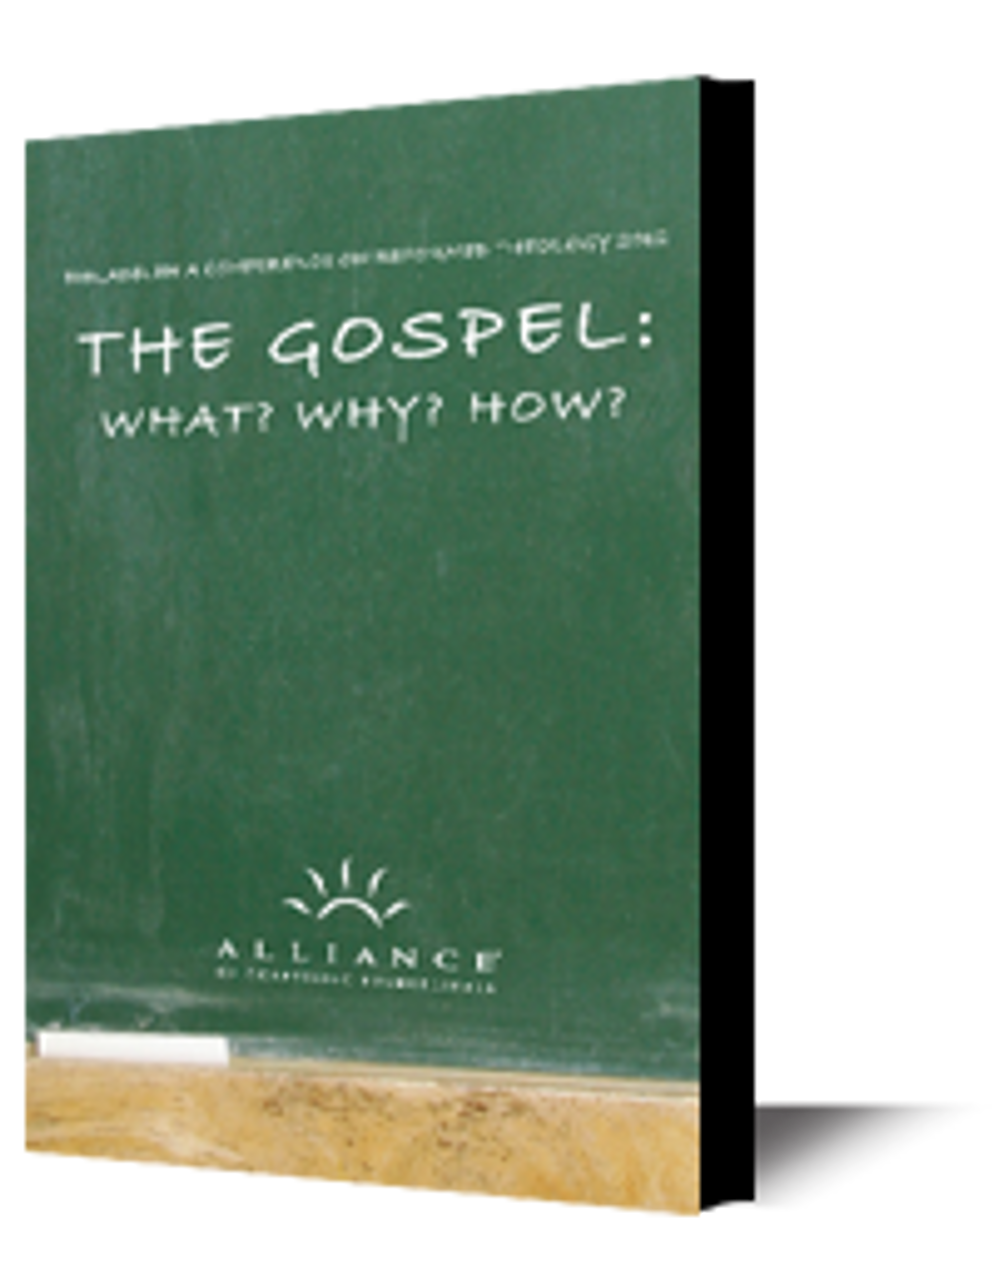 The Gospel: What? Why? How? PCRT 2012 (CD Set)